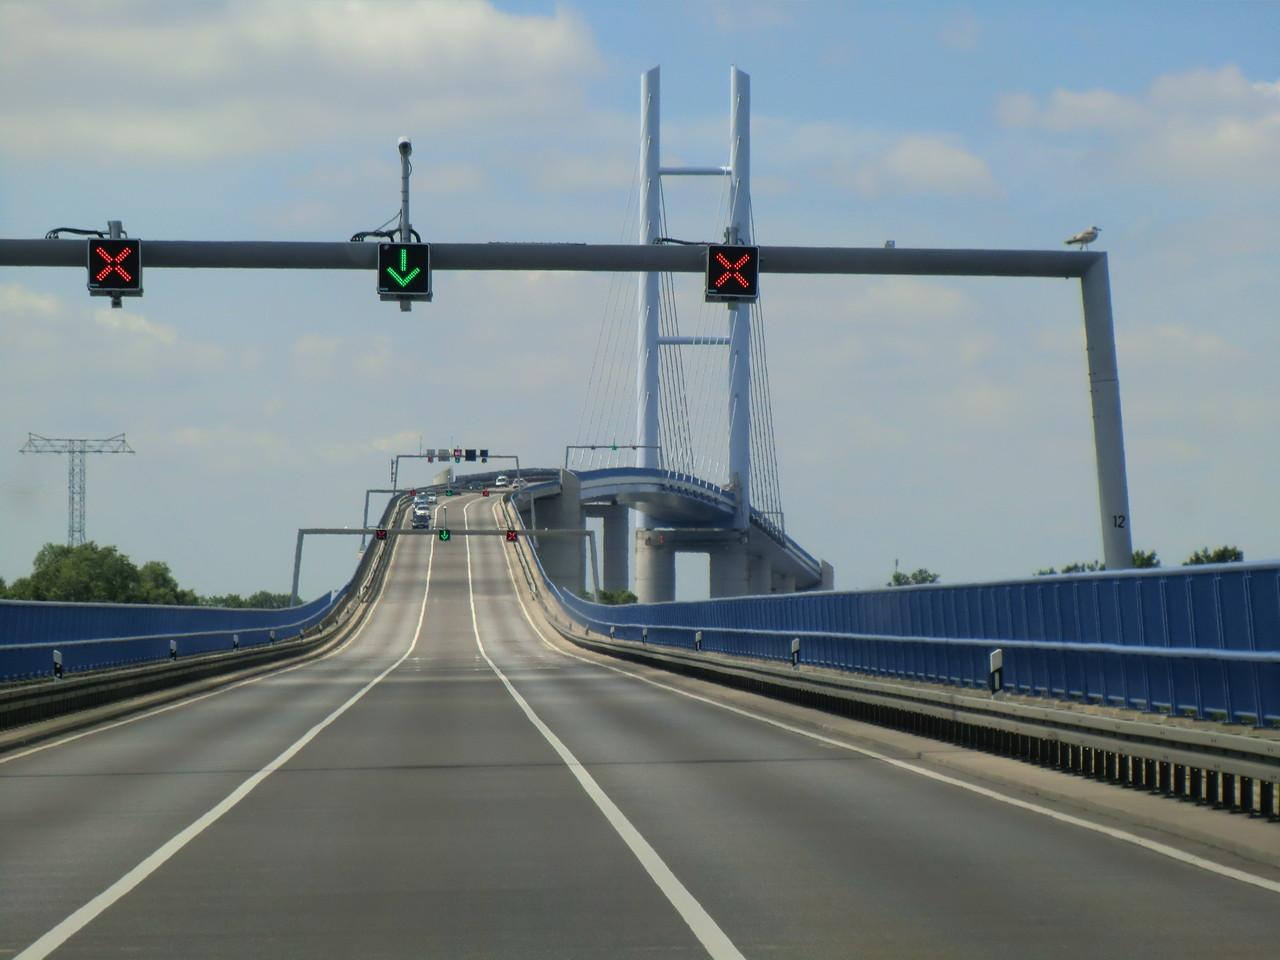 Über die 2830 m lange Rügenbrücke